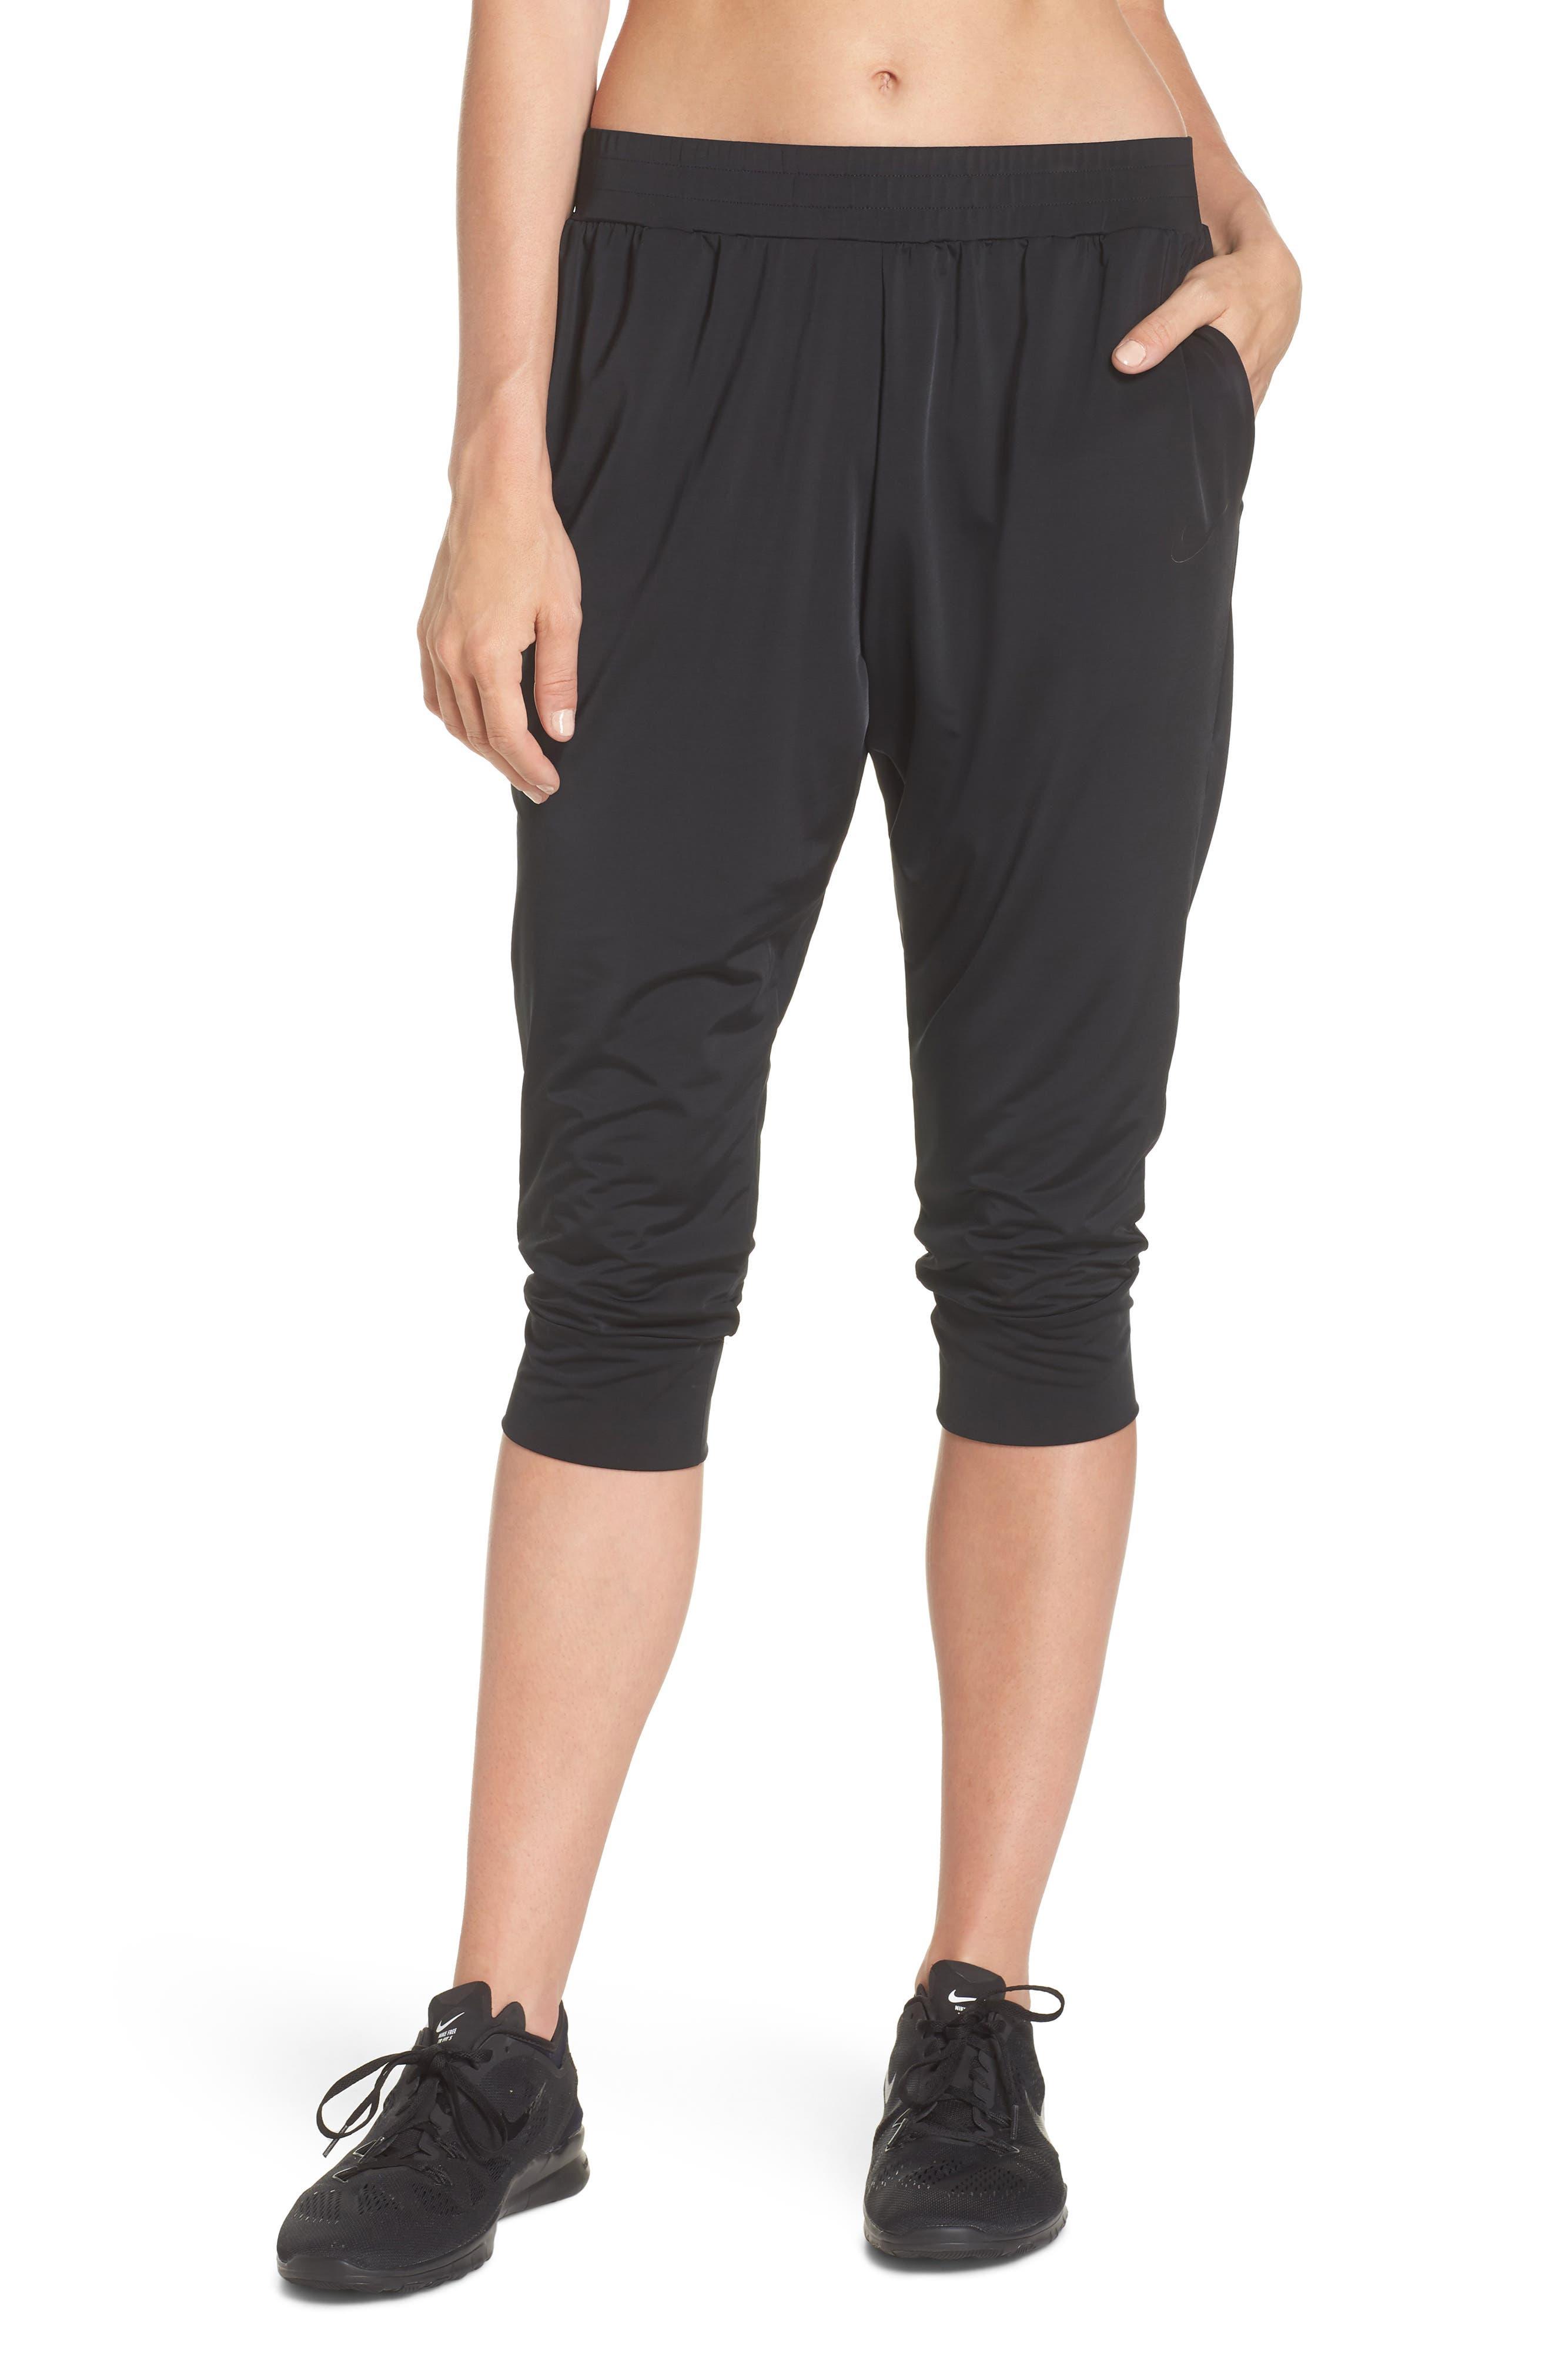 Dry Touch Training Pants,                             Main thumbnail 1, color,                             Black/ Black